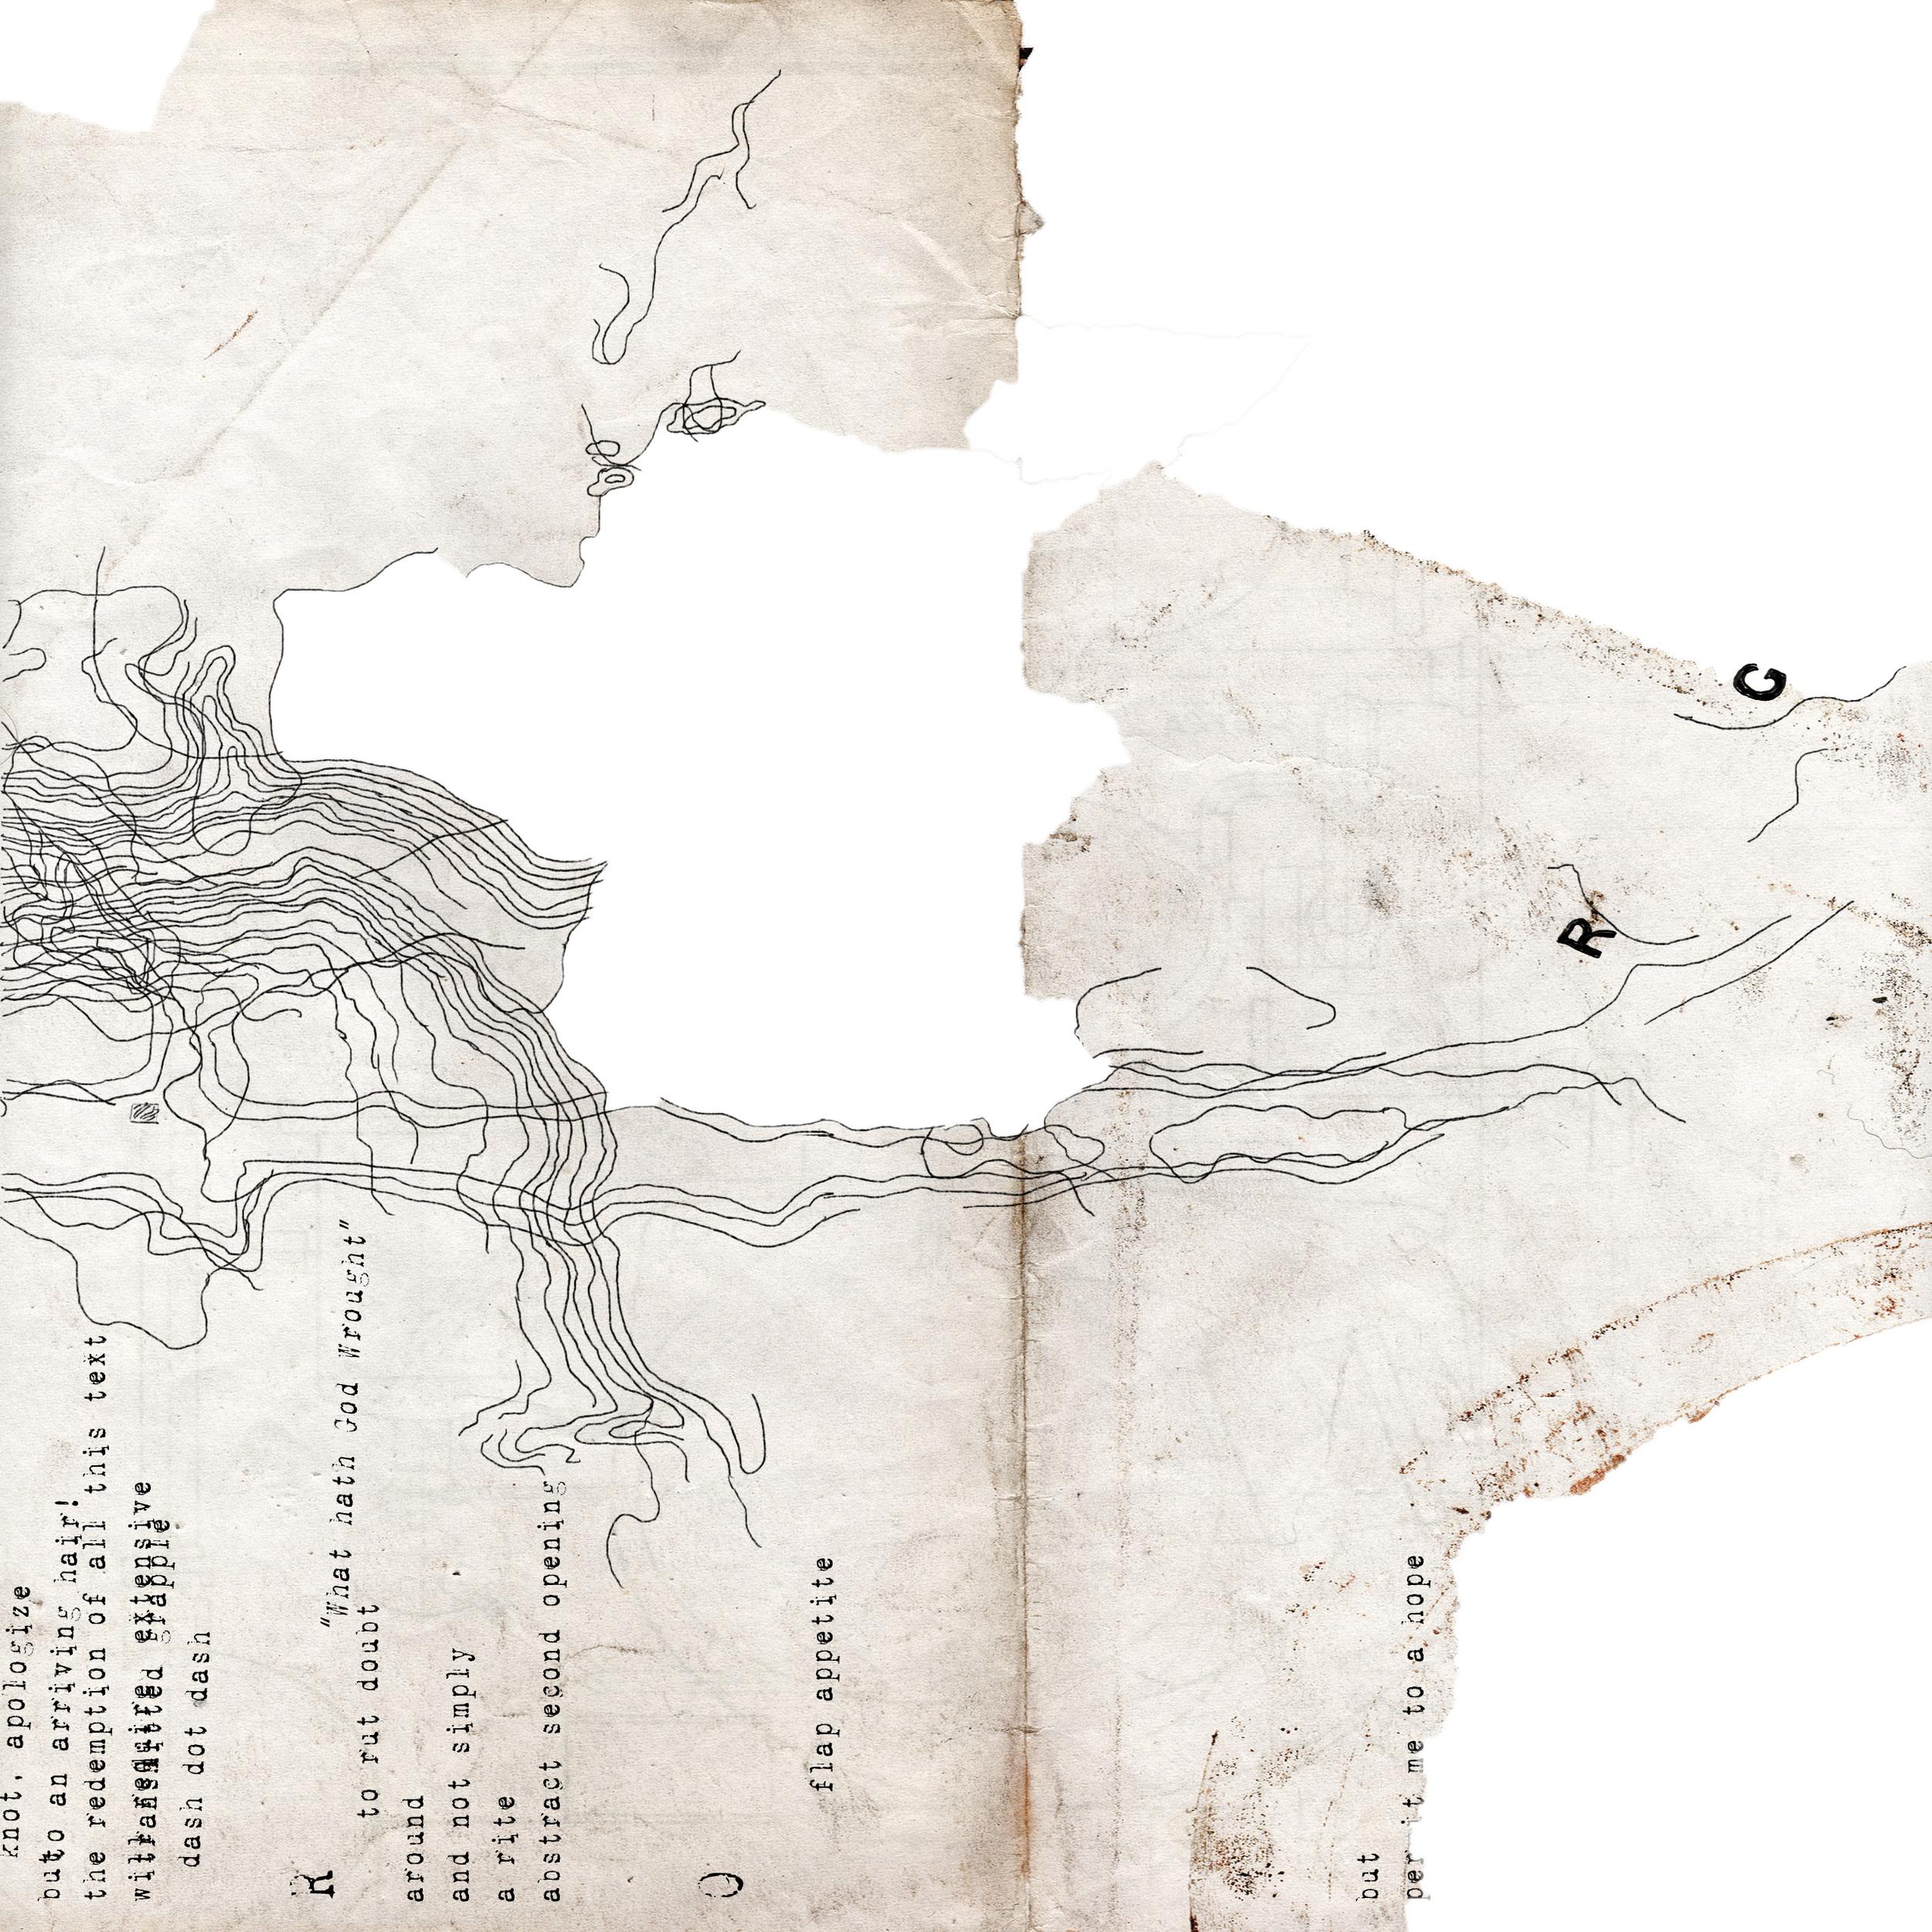 Grand Canyon Map 9.2 copy copy.jpg